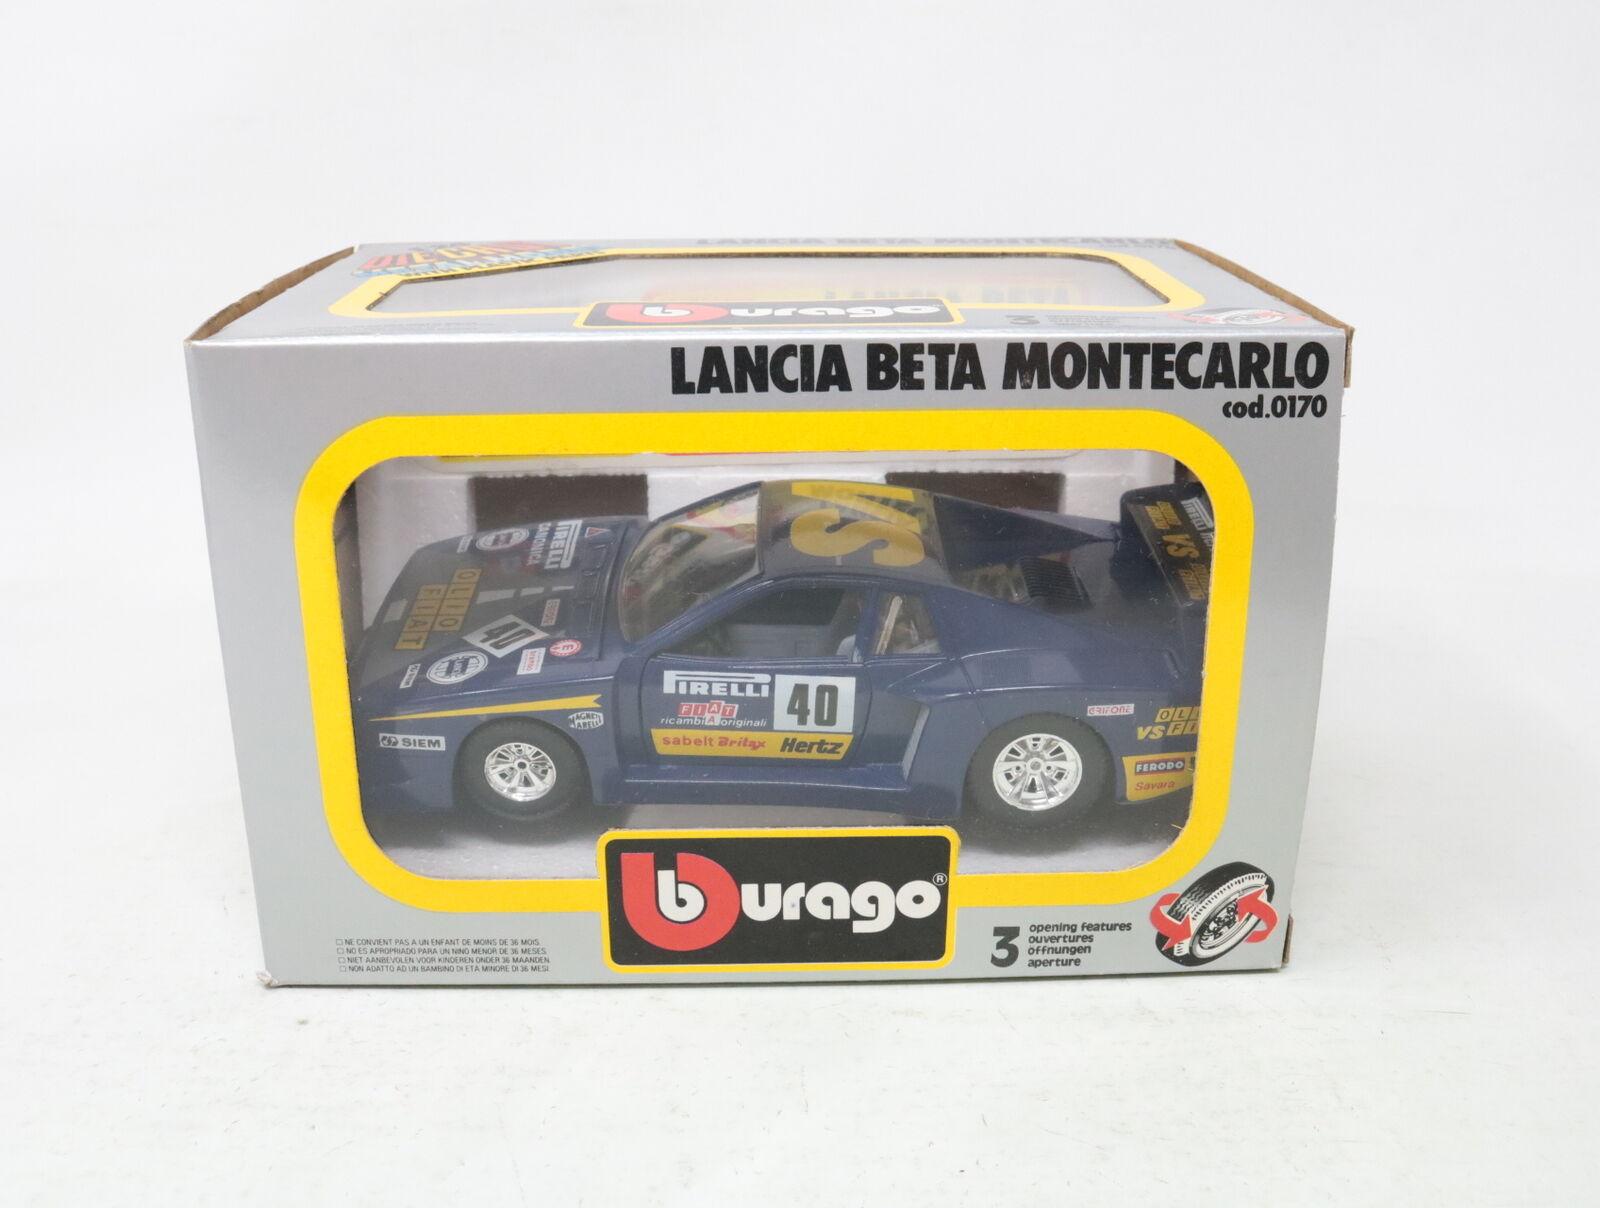 1 24 BBURAGO LANCIA BETA MONTEautoLO cod. 0170  [KT005]